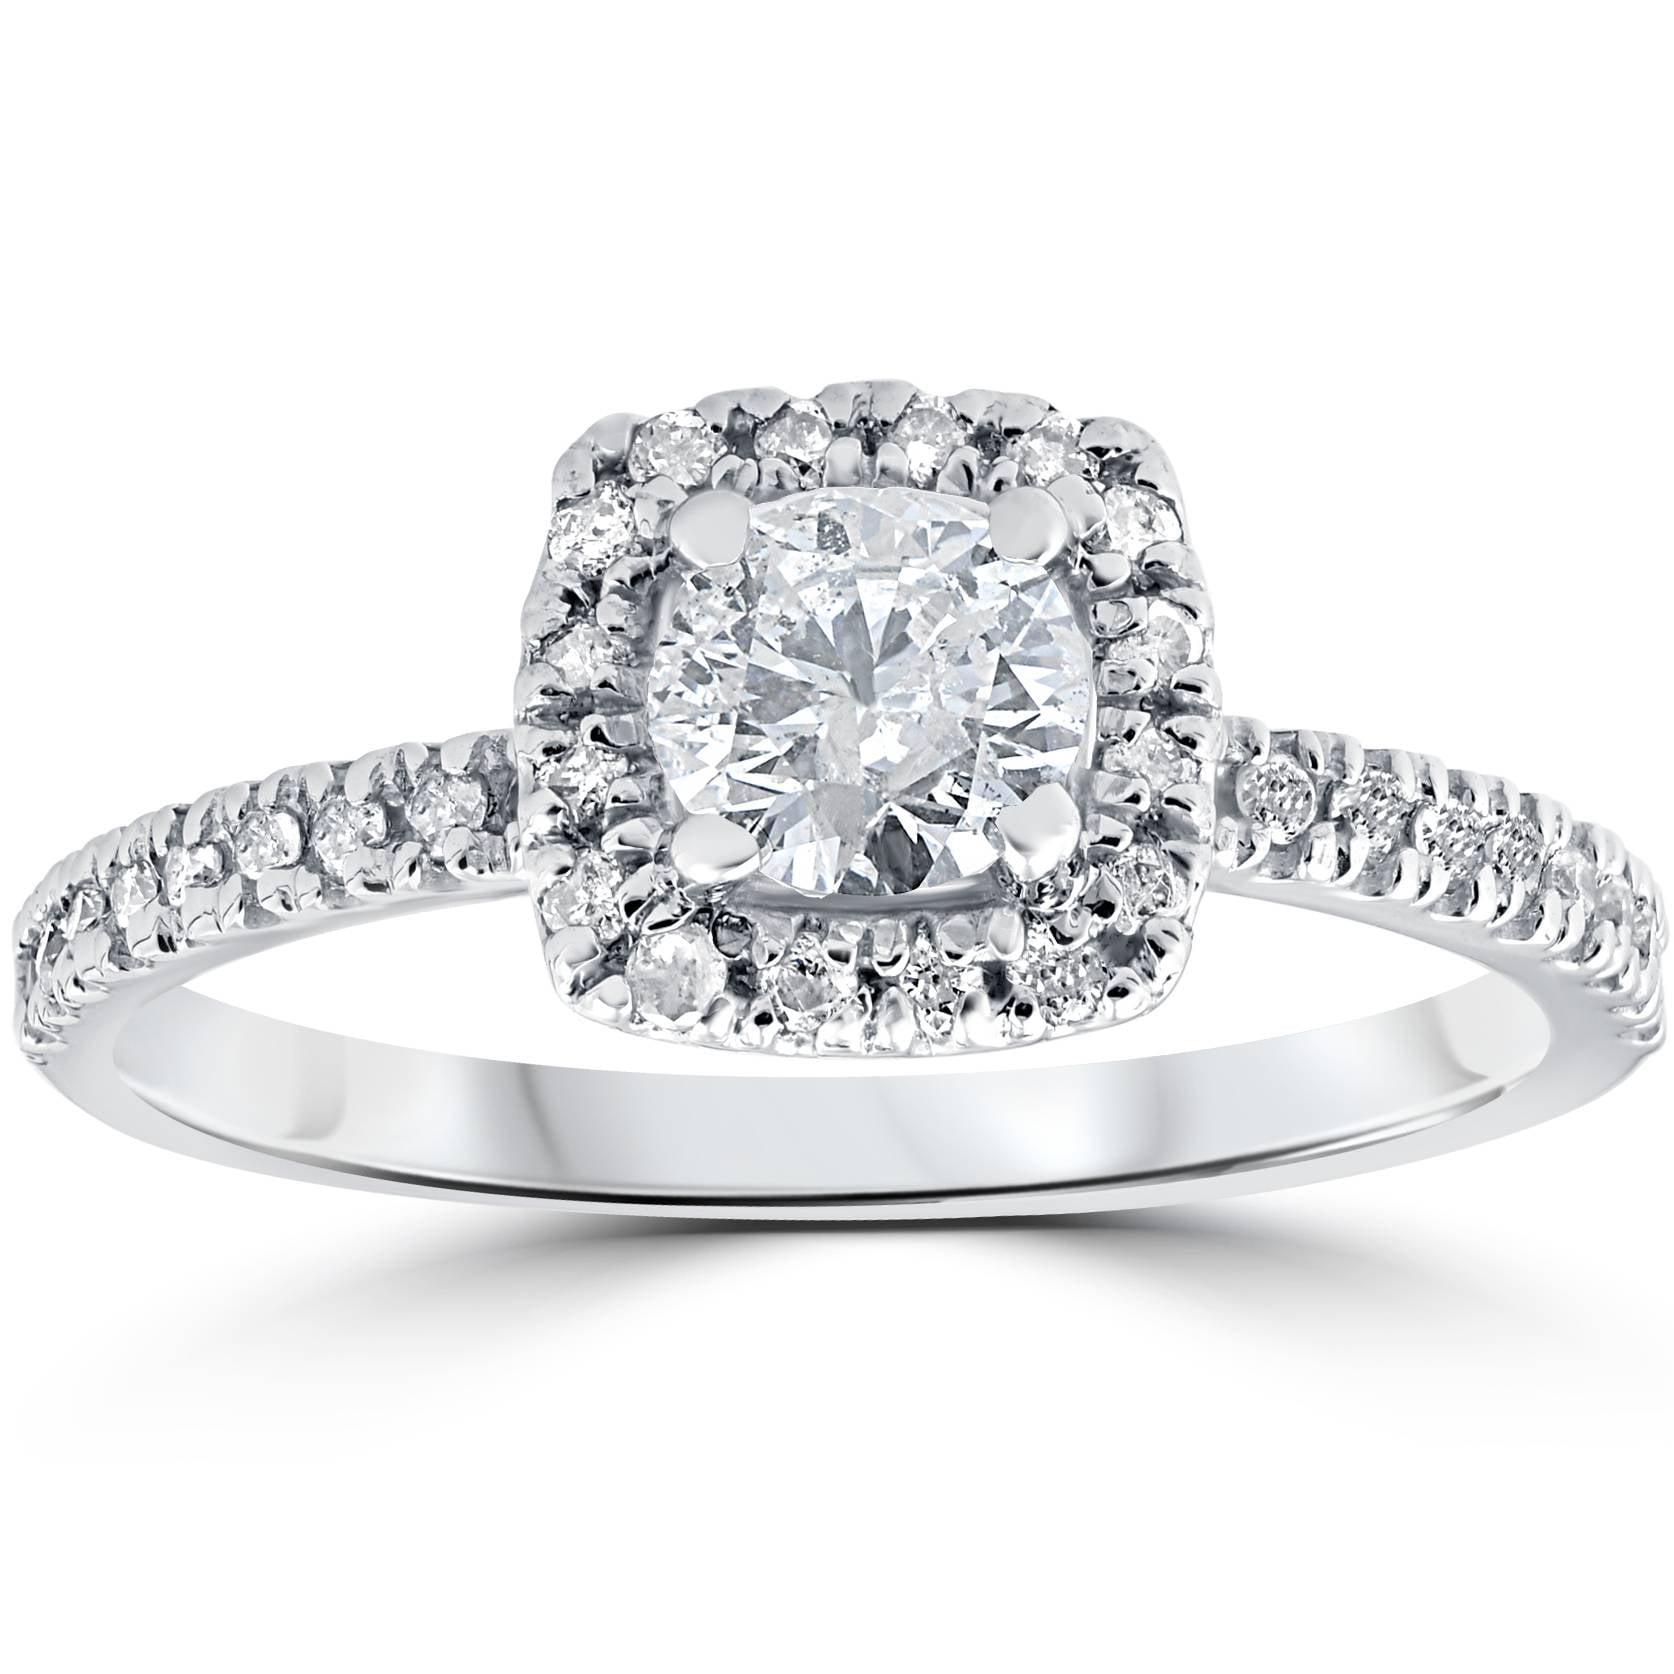 3 4ct Cushion Halo Diamond Engagement Ring 14K White Gold by Pompeii3